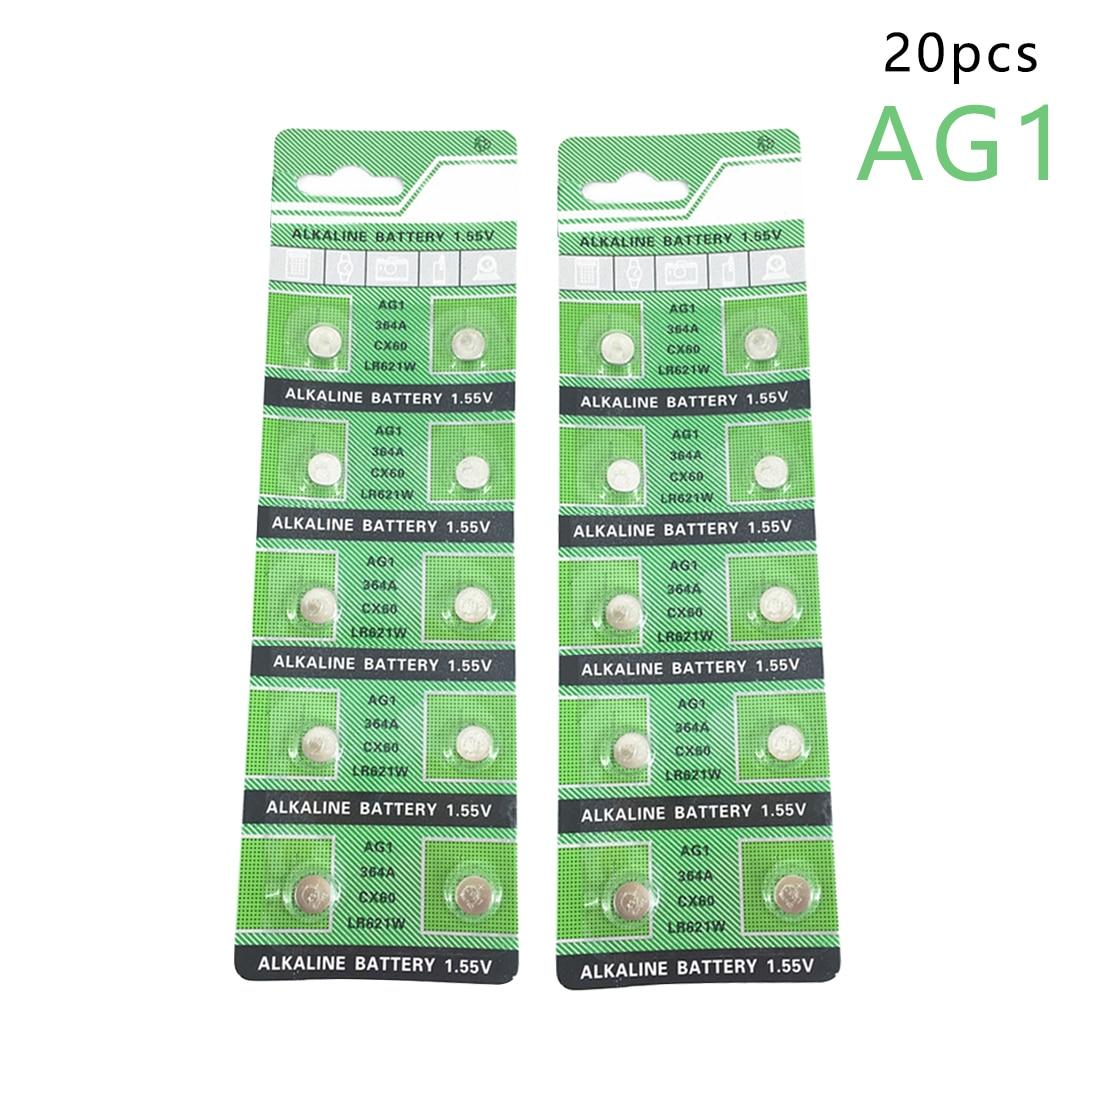 Centechia 20 Pcs Button Battery Ag1 364 Sr621 Sr60 Sr60L Alkaline Coin Cell Button Batteries For Wat